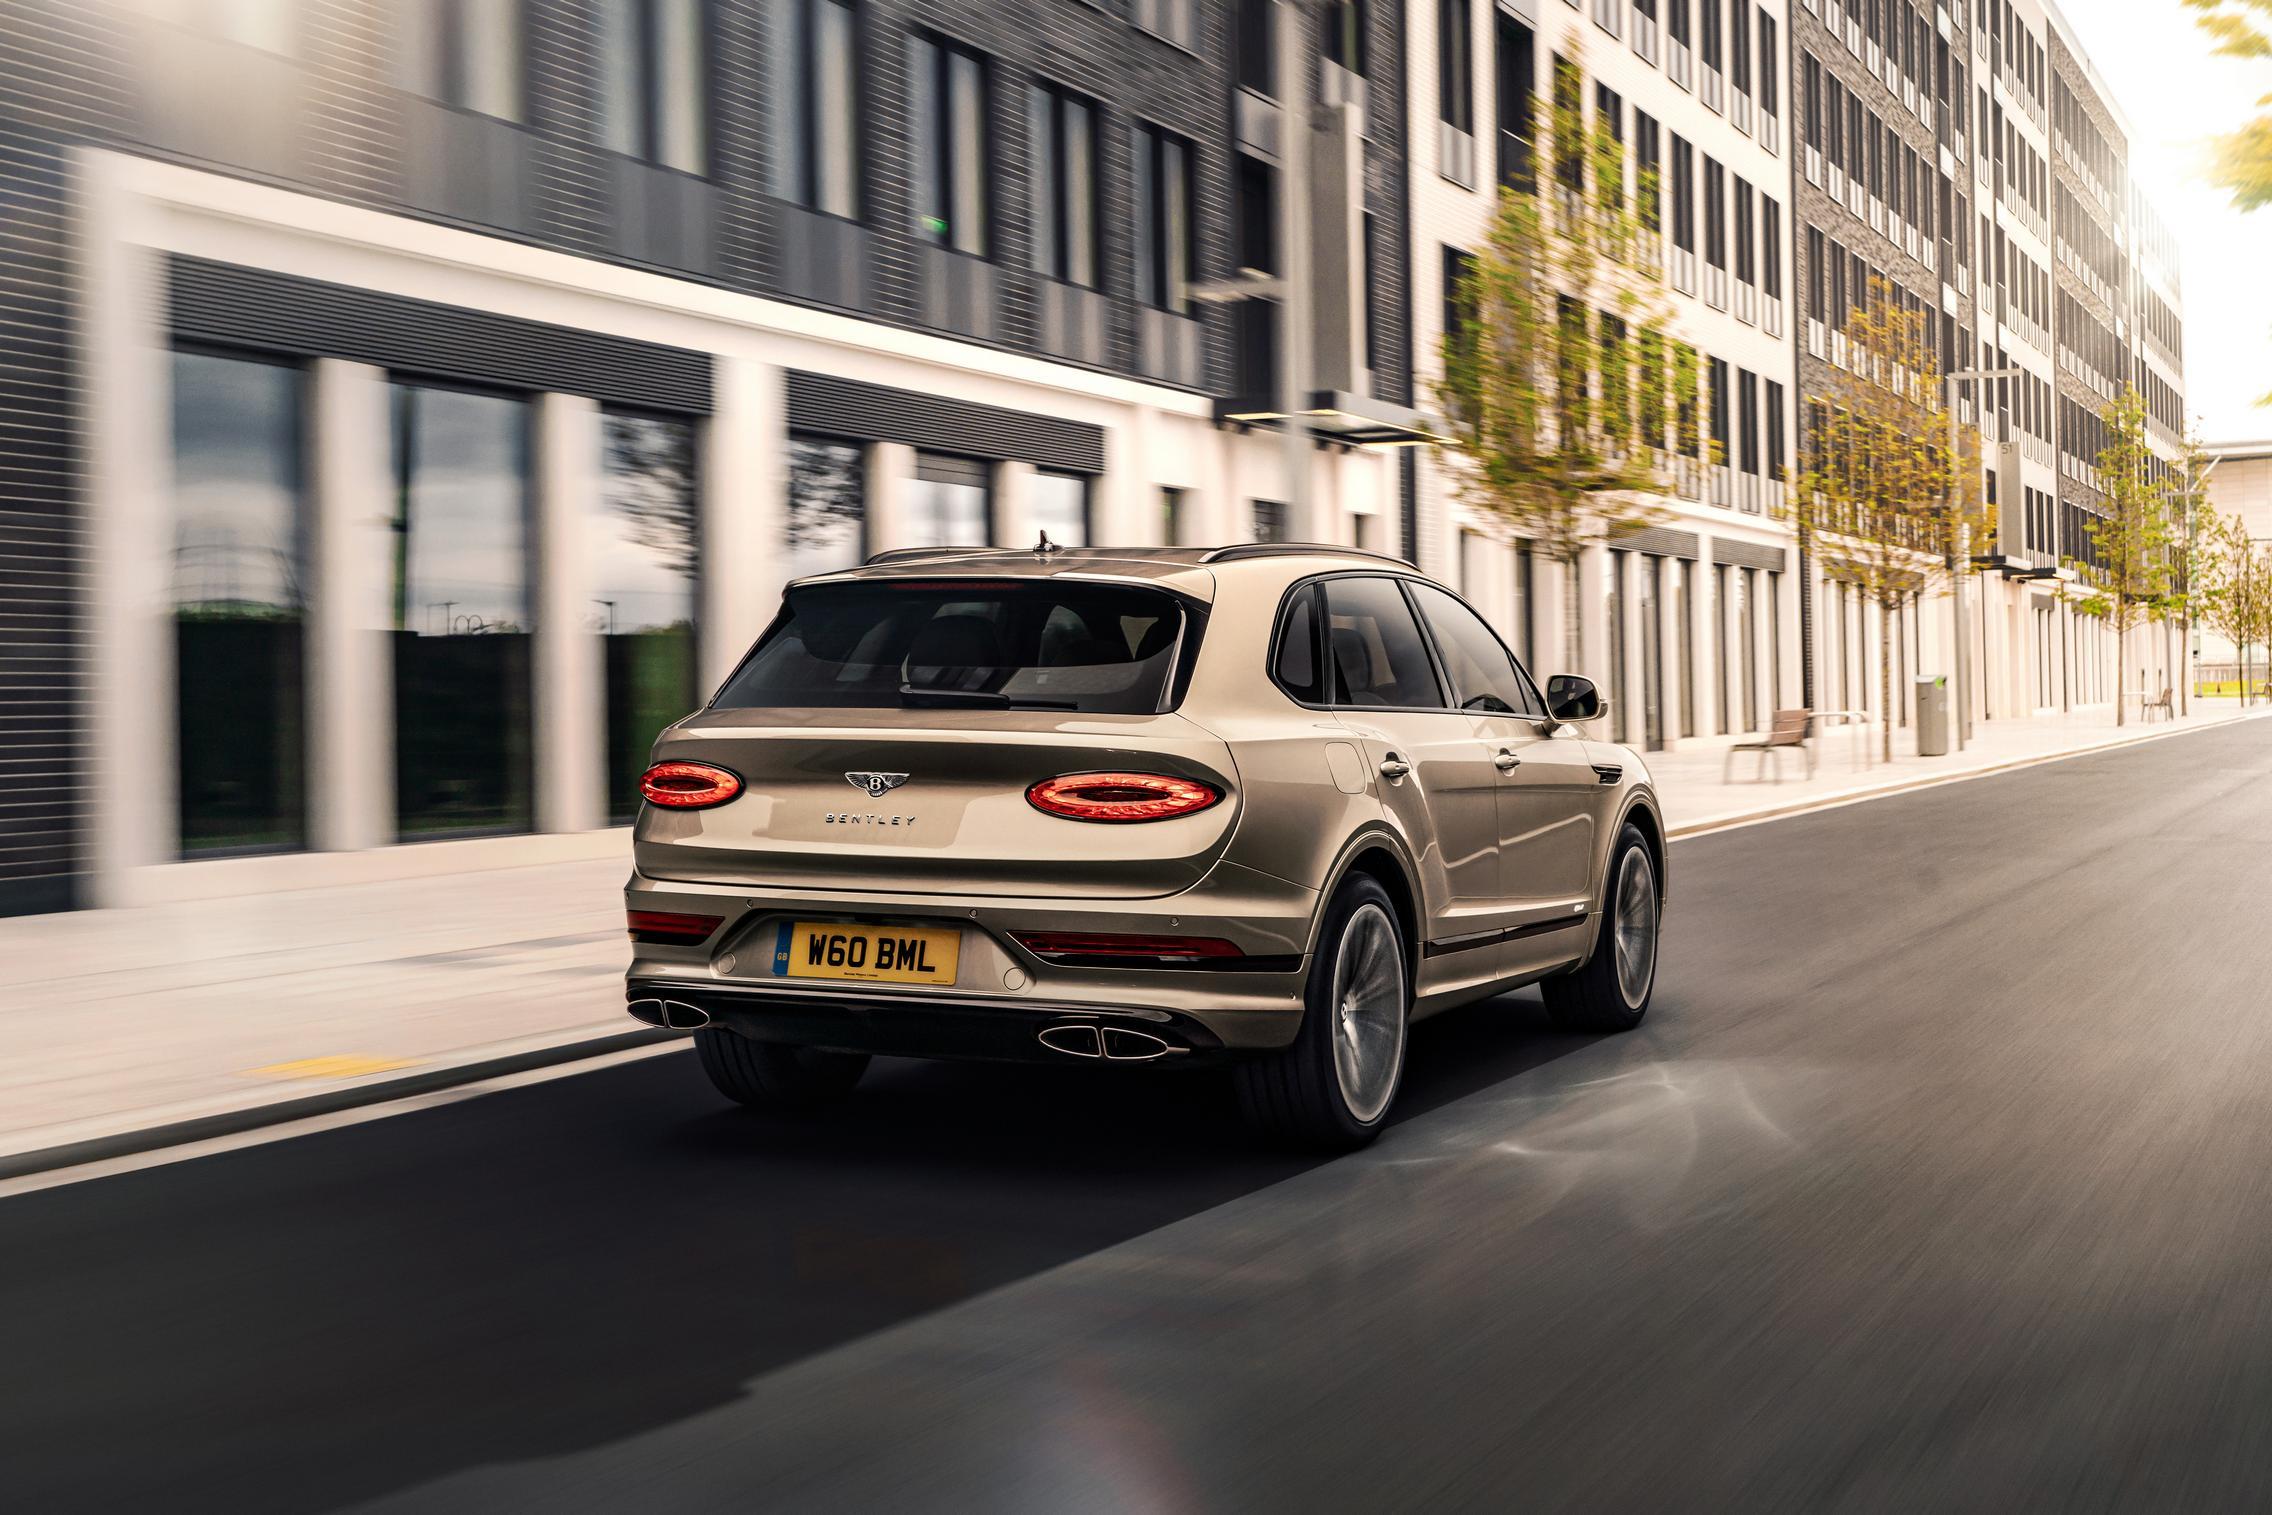 2021 Bentley Bentayga Hybrid Specs